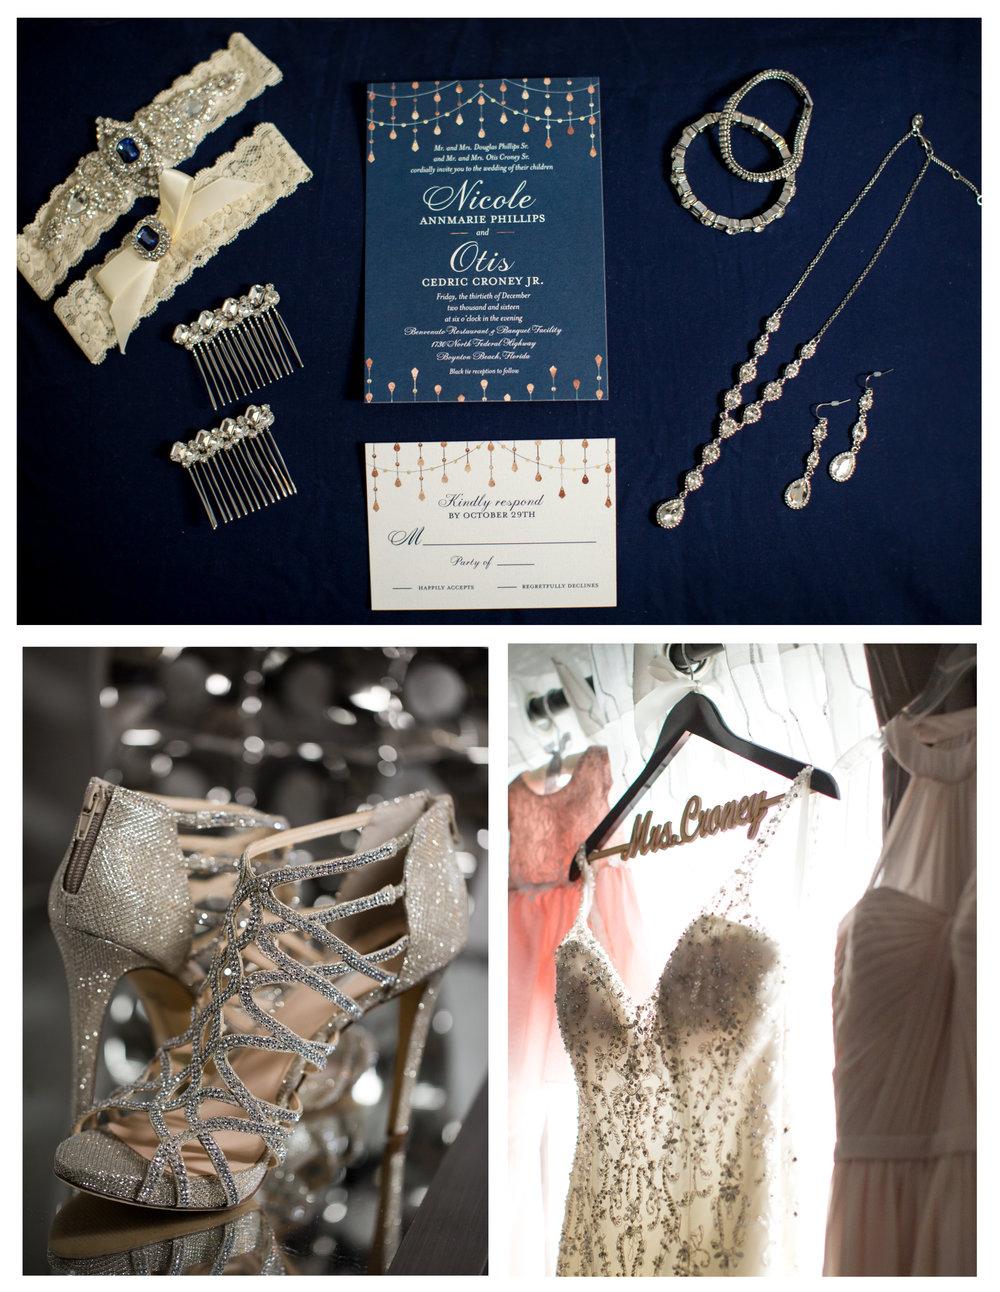 Benvenuto_wedding_Boynton_Beach_Jodi_Fjelde_Photography_Nikki_Otis_married_2.jpg